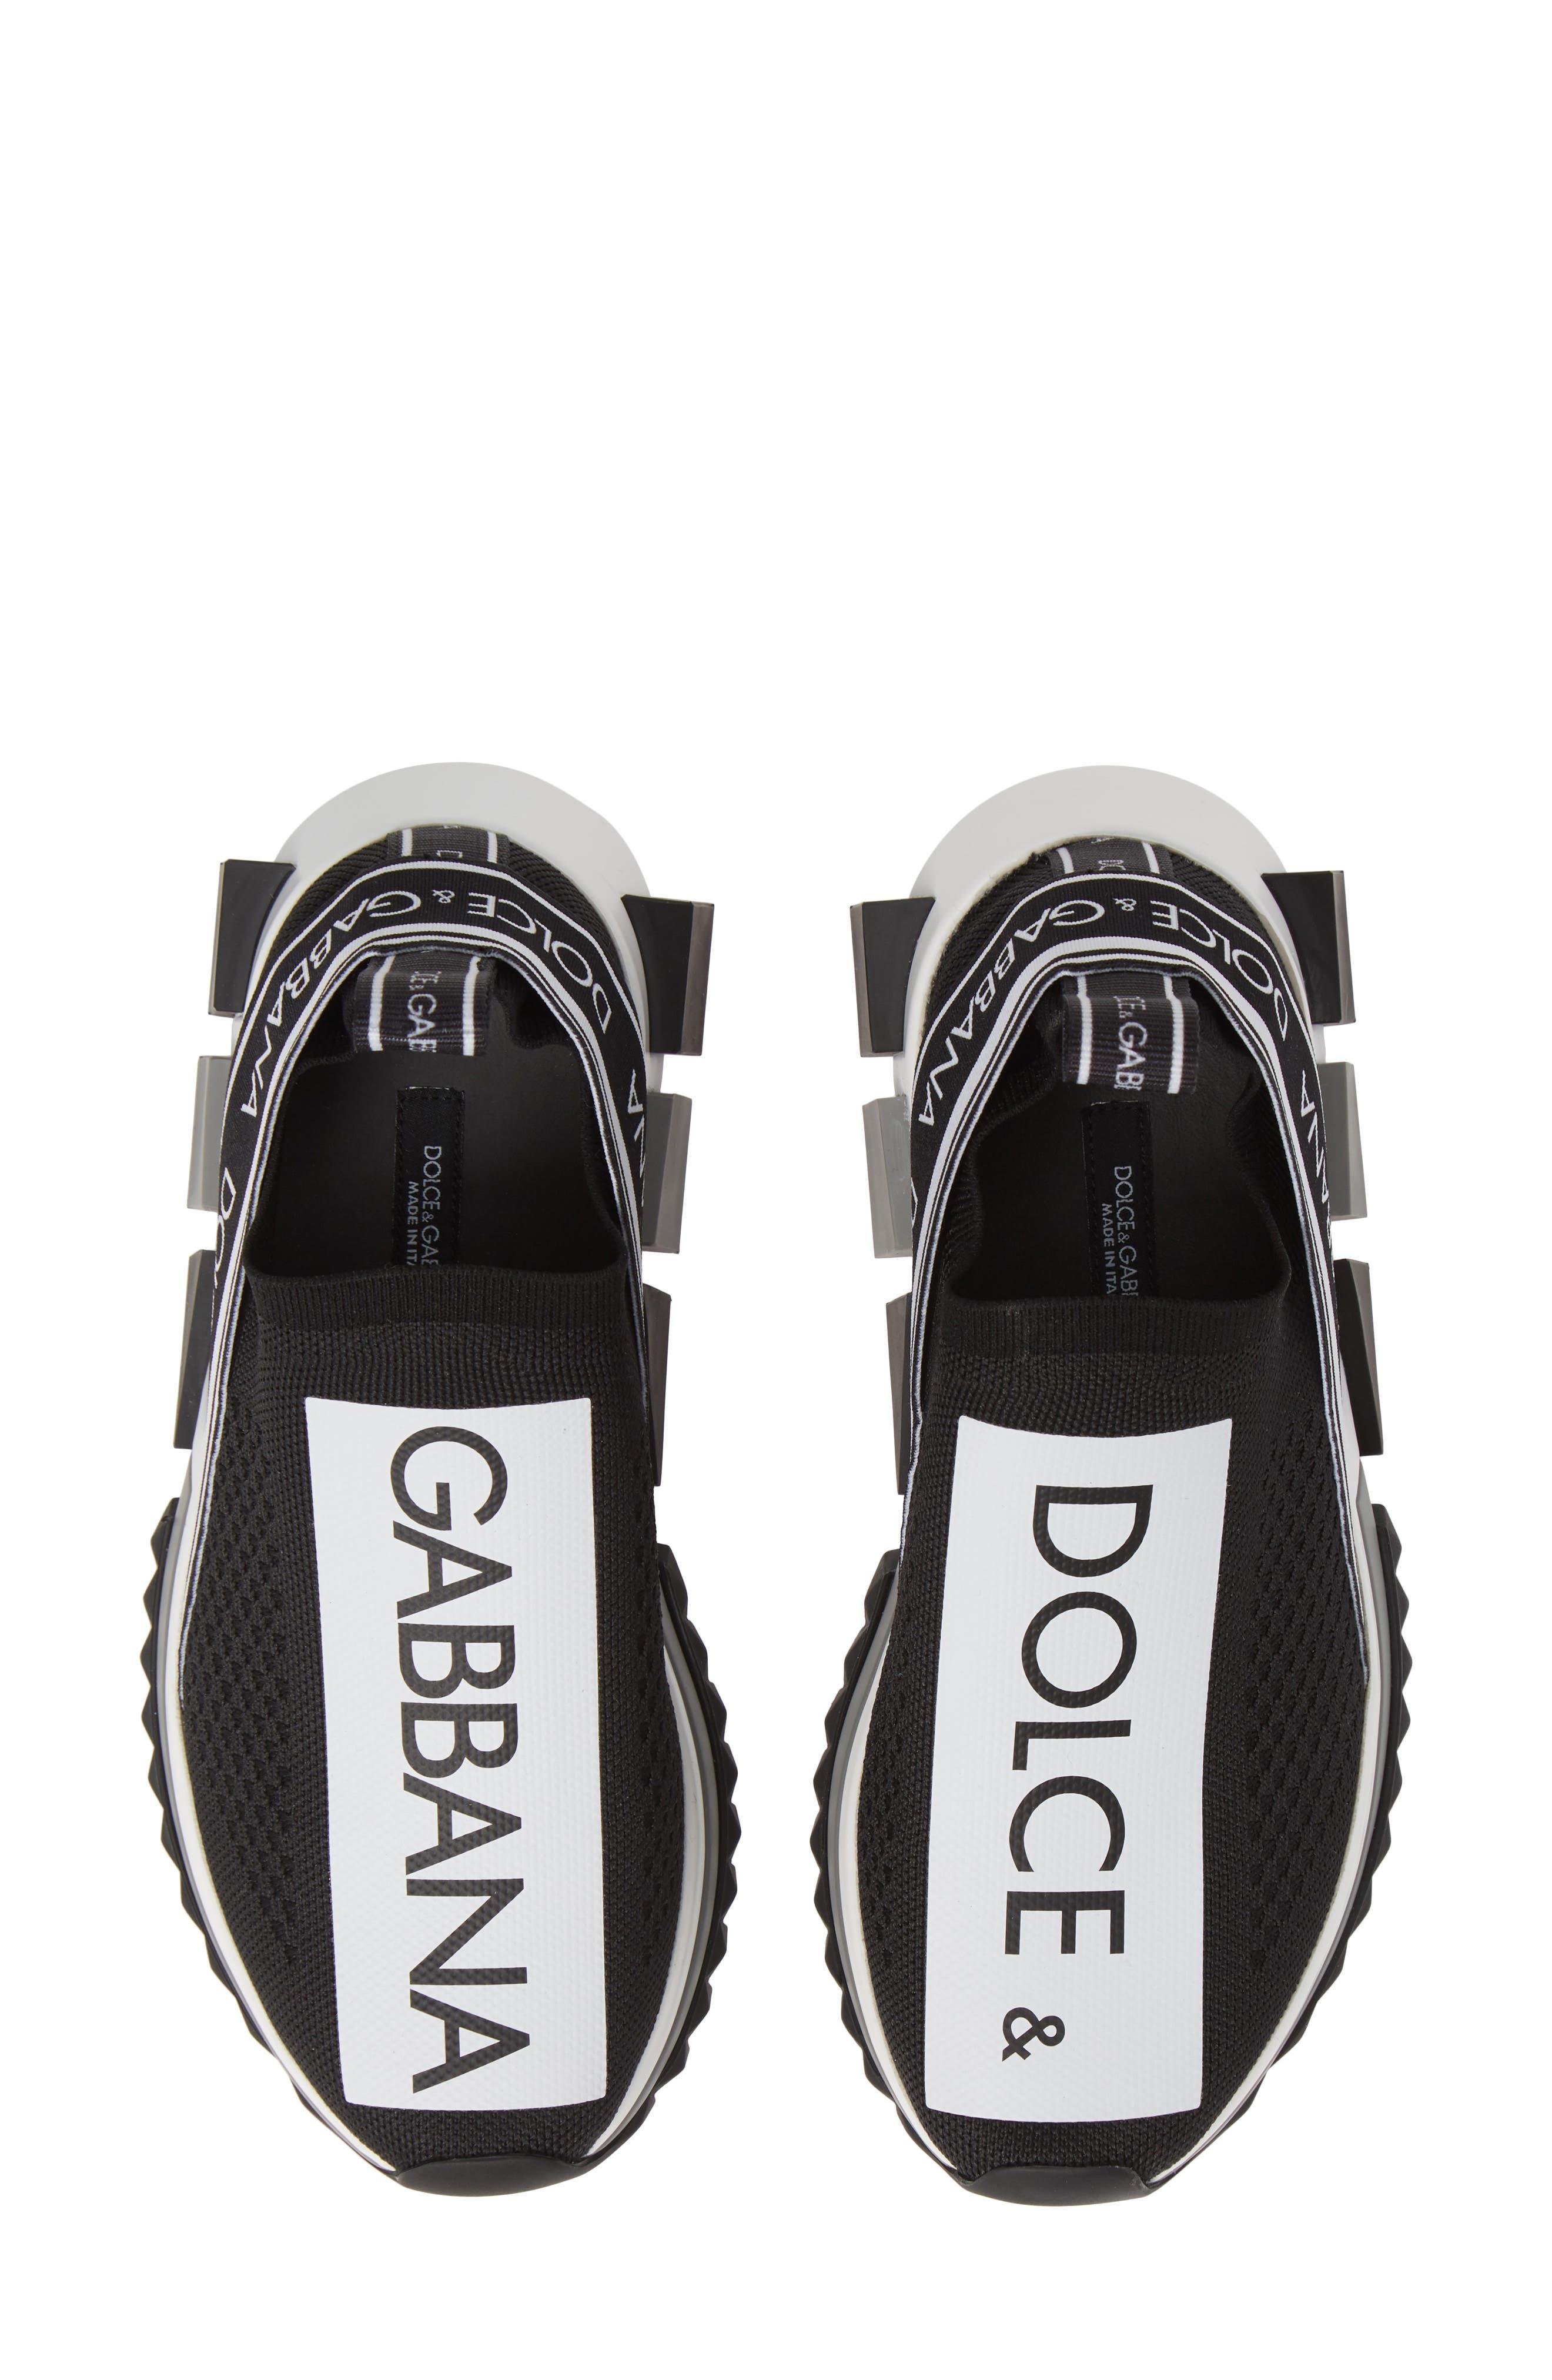 e291ac648 Women's Dolce&Gabbana Shoes   Nordstrom